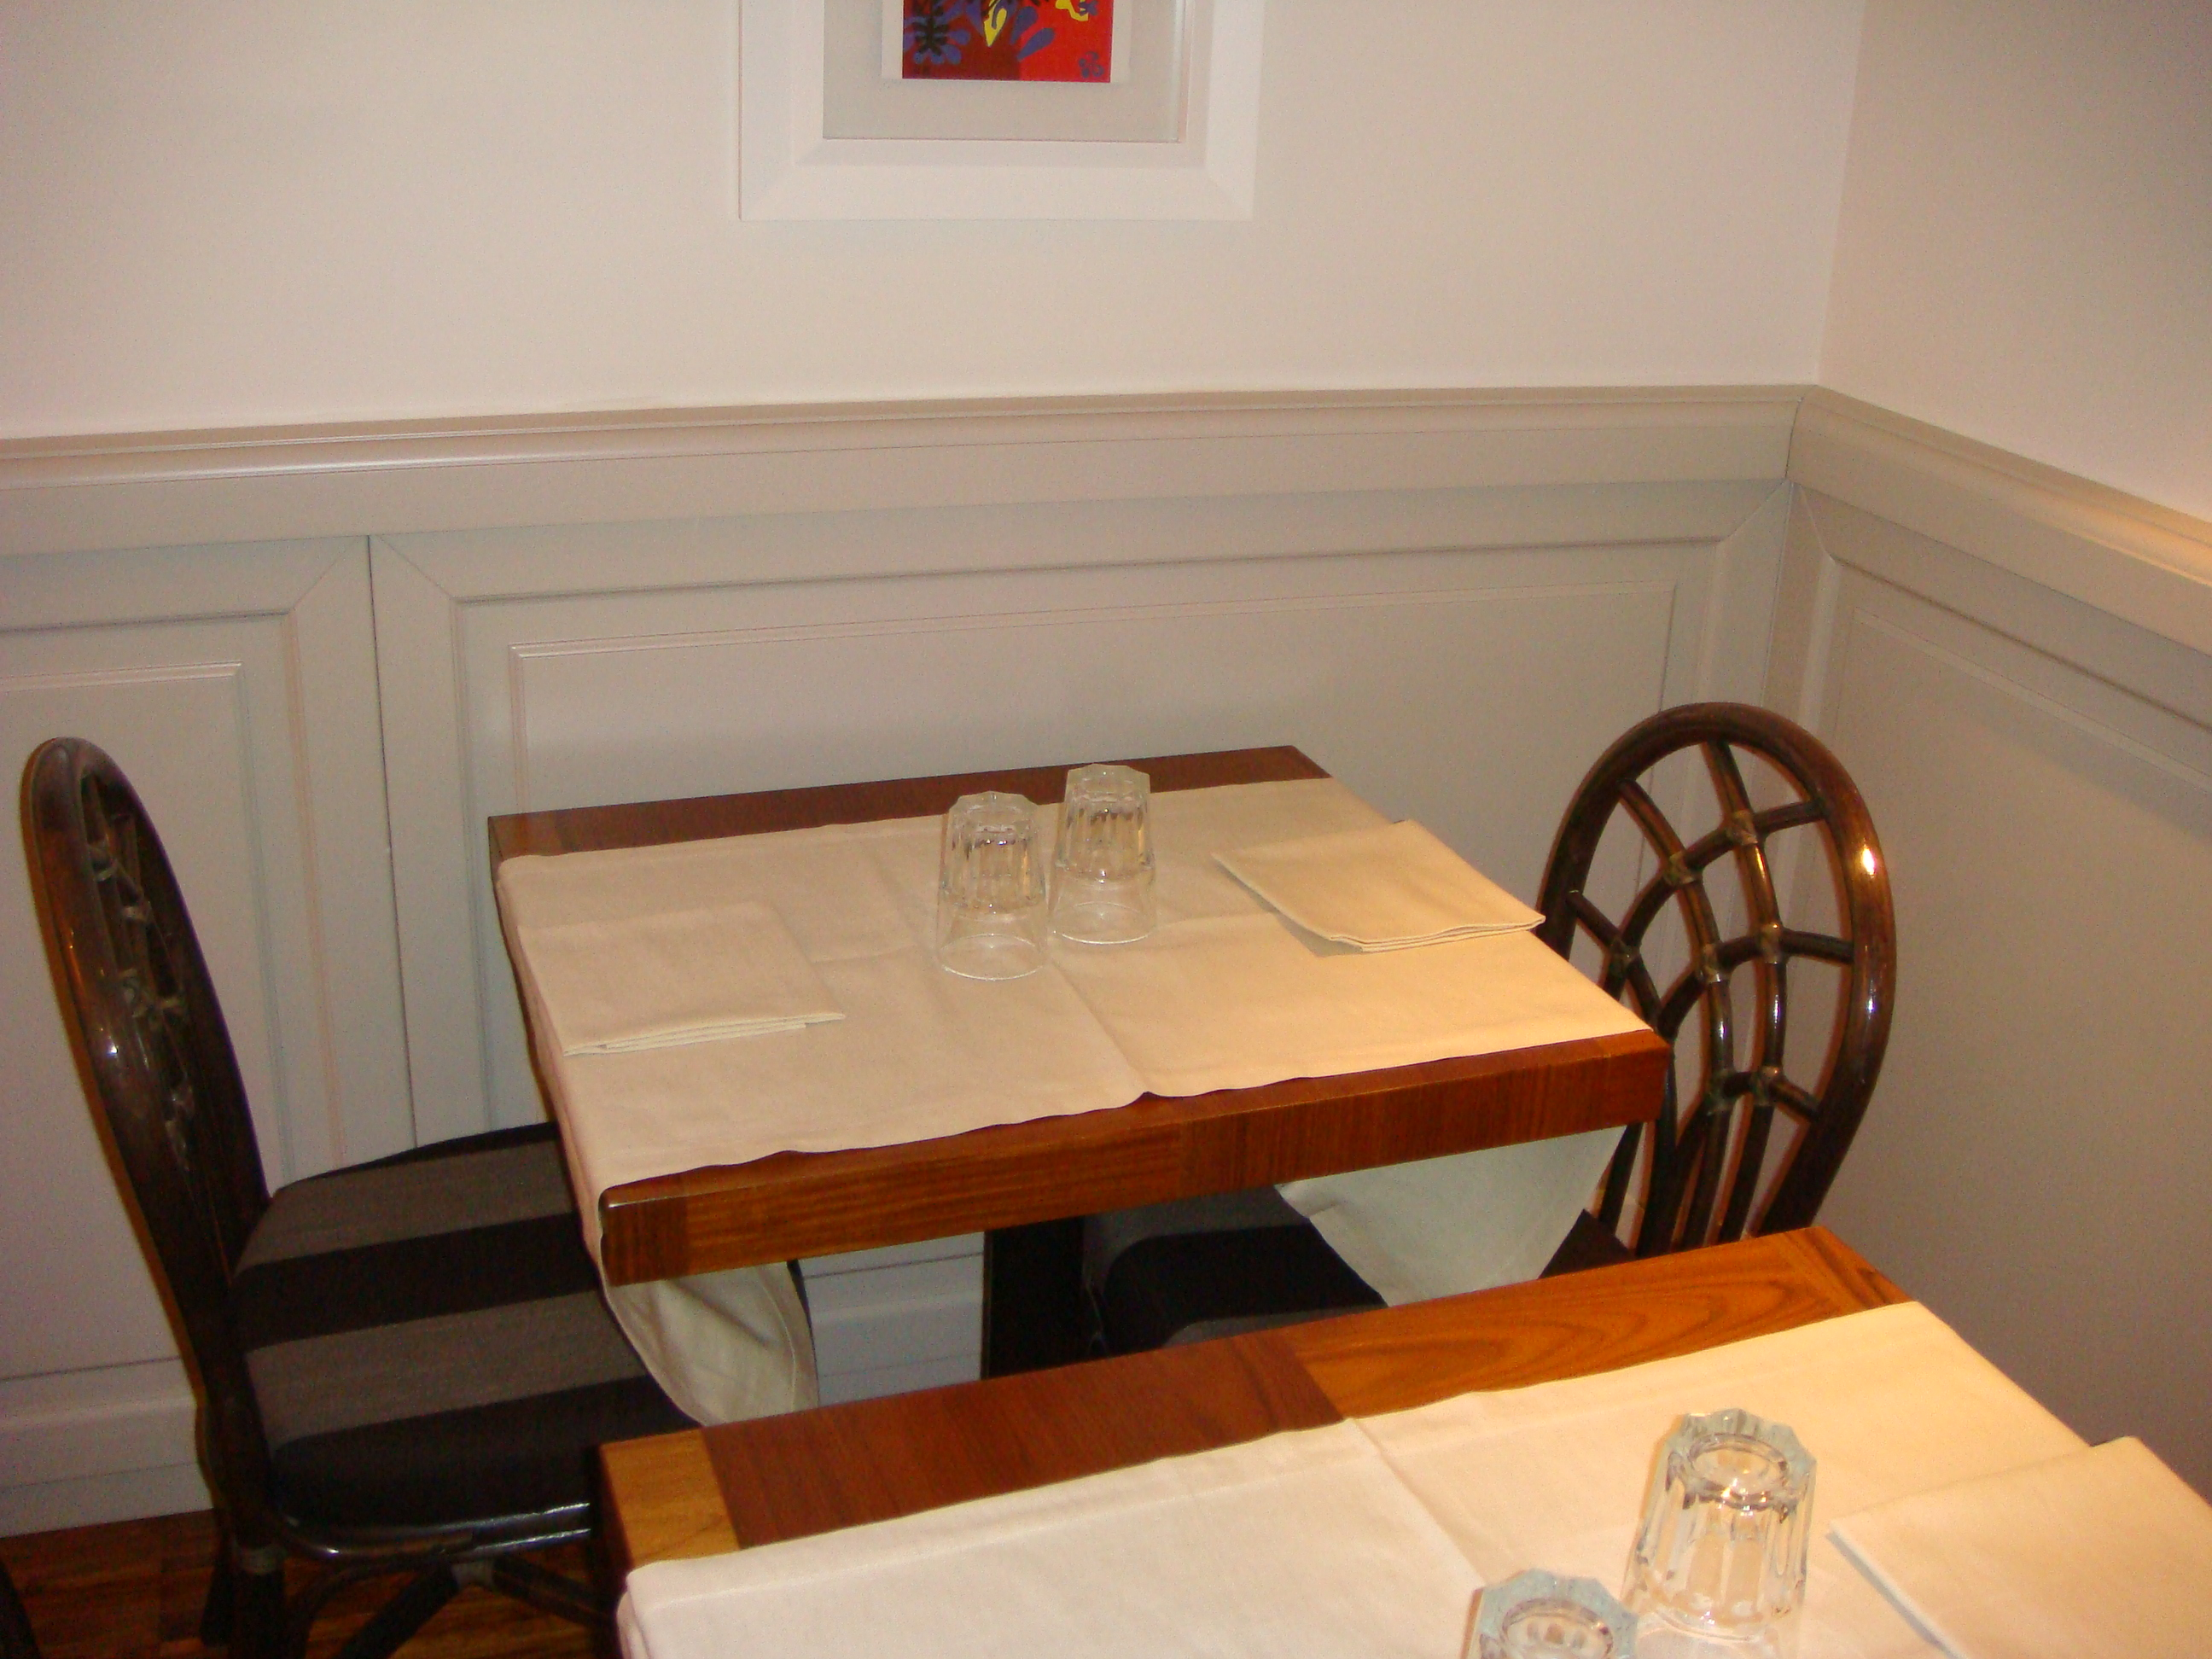 boiserie ristoranti roma